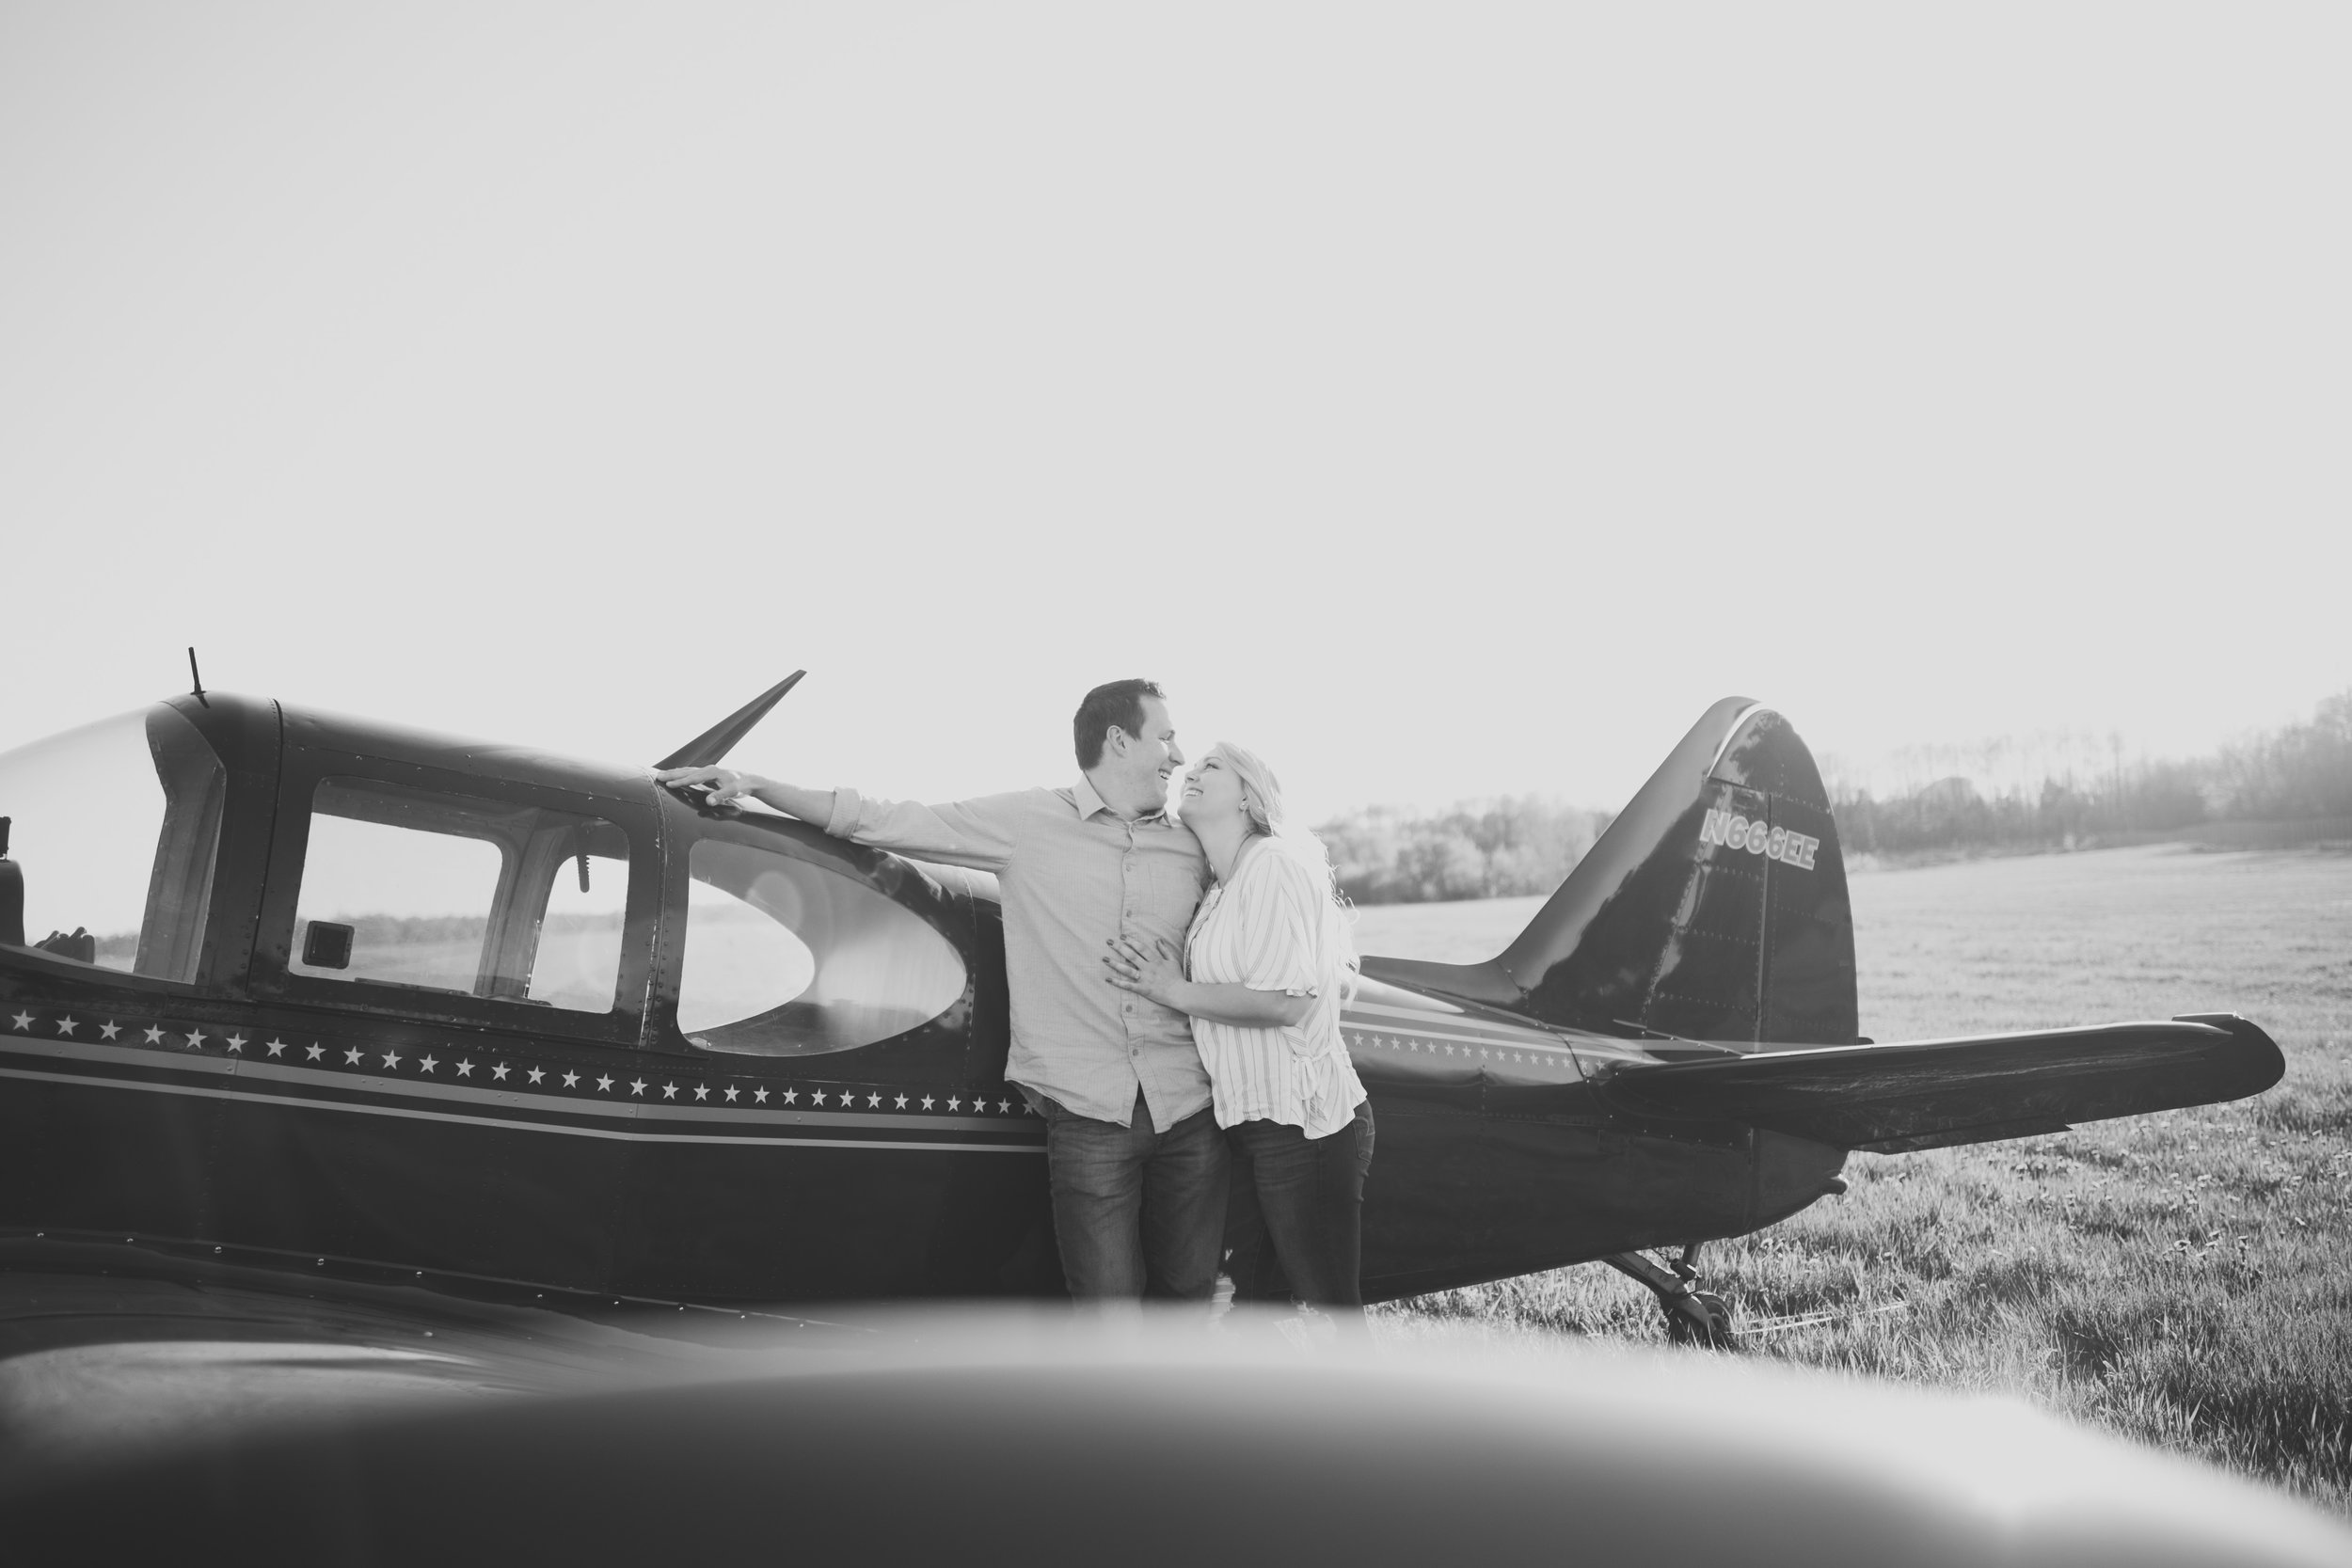 Grand Rapids Photographer - J Darling Photo - jessica darling - grand rapids wedding photographer - sparta airport - sparta michigan - jasmine and jeff engaged 034.jpg